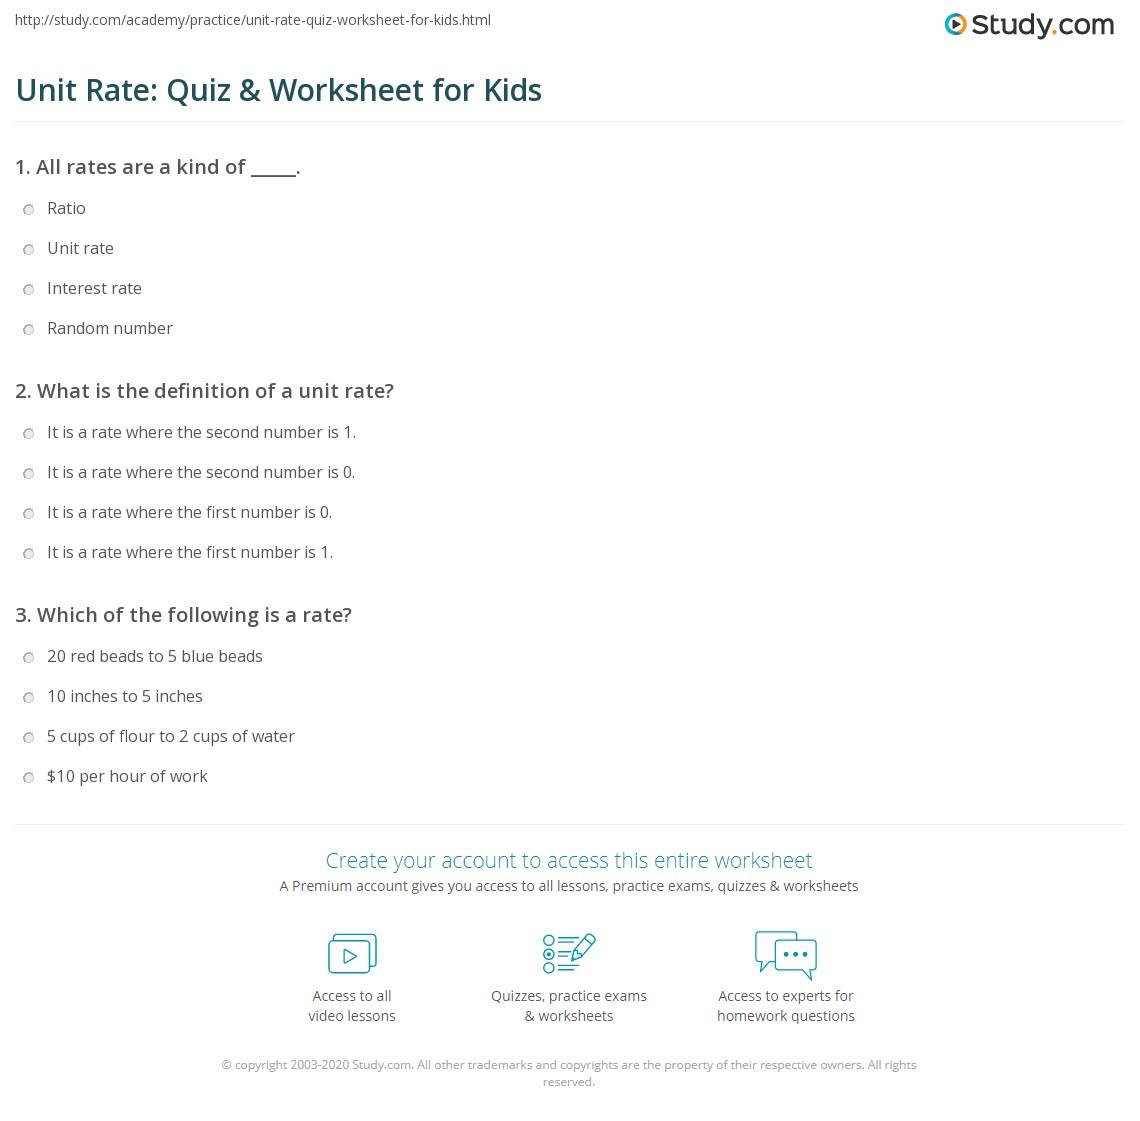 Unit Rate: Quiz & Worksheet for Kids   Study.com